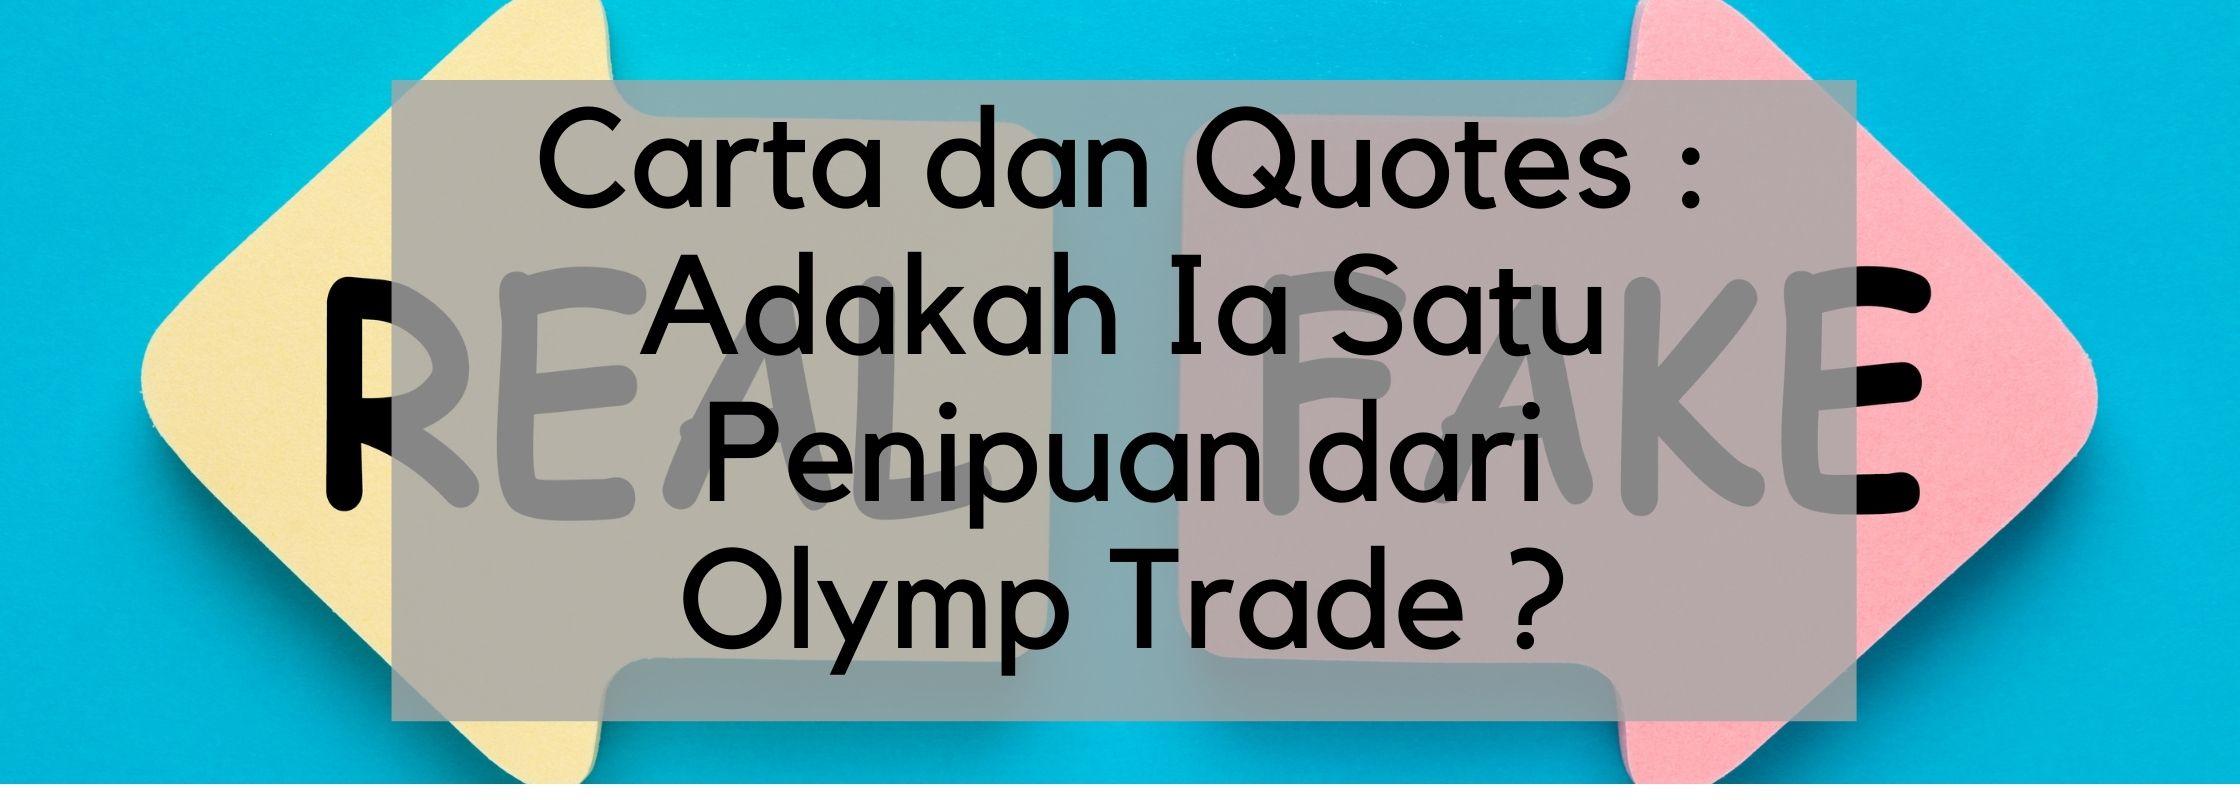 Olymp Trade Penipu